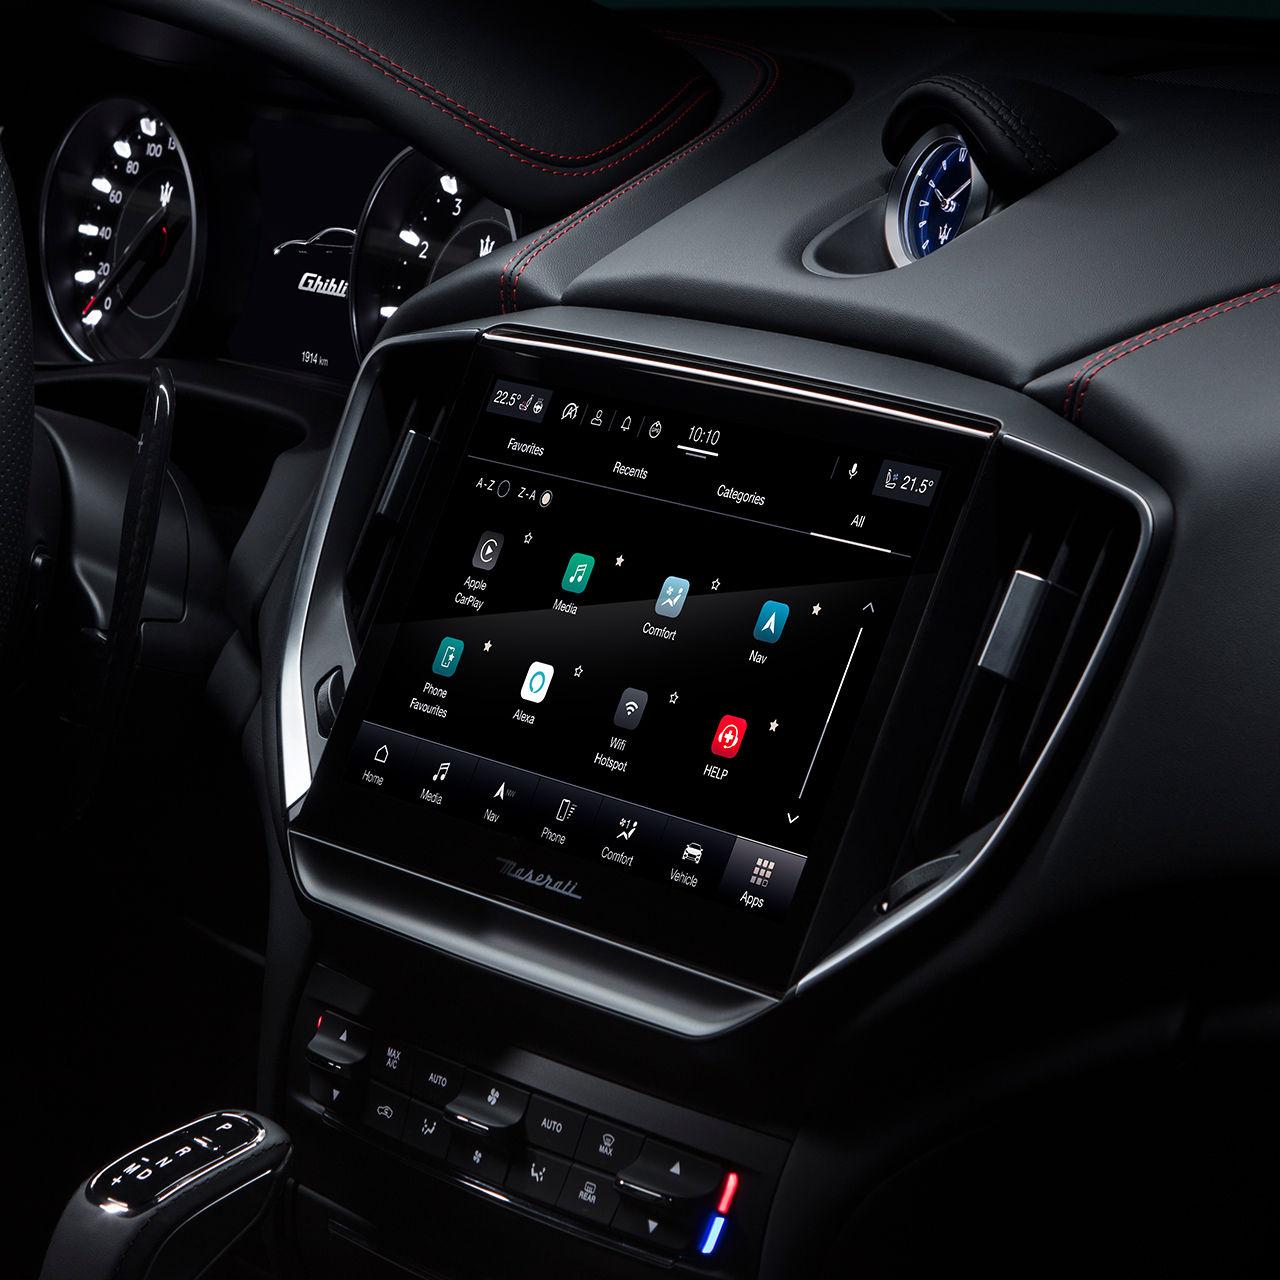 Maserati Ghibli - Maserati Connect - Display